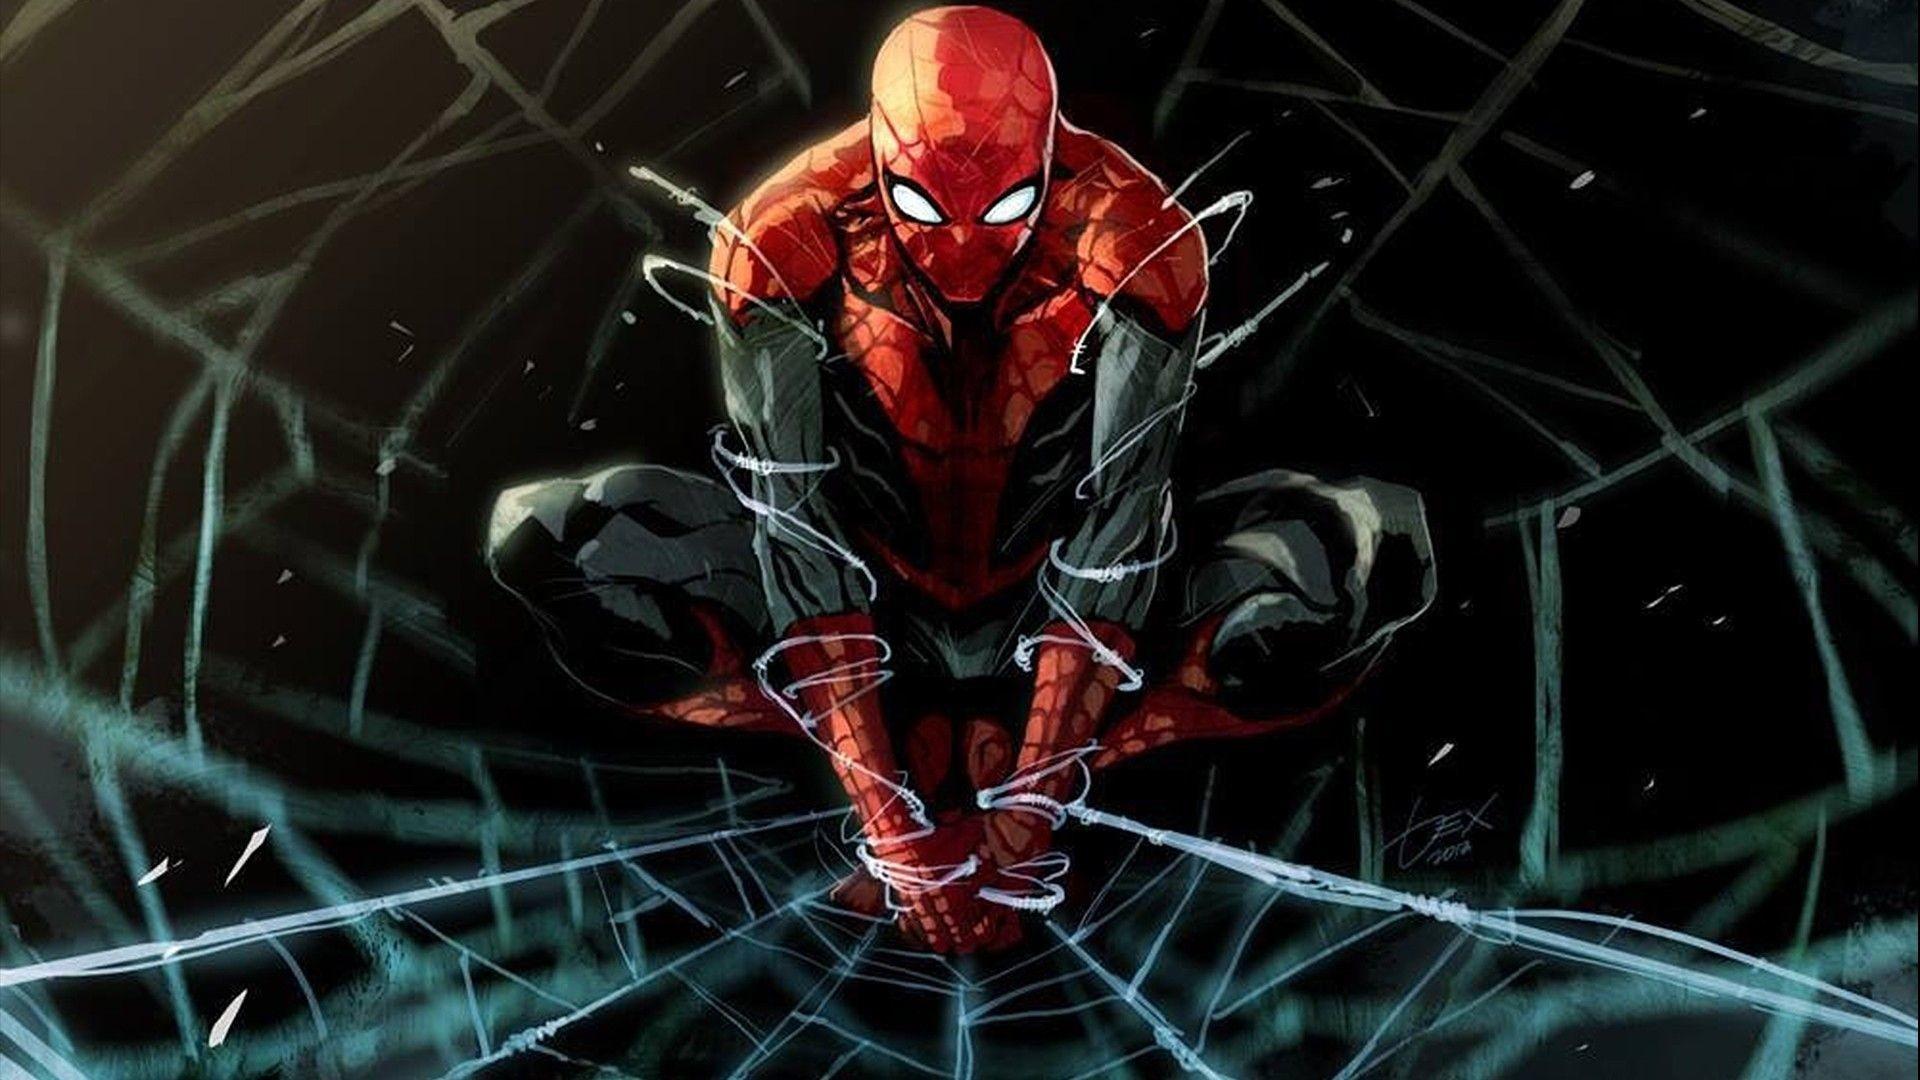 1920x1080 30+ Best Spiderman Wallpapers